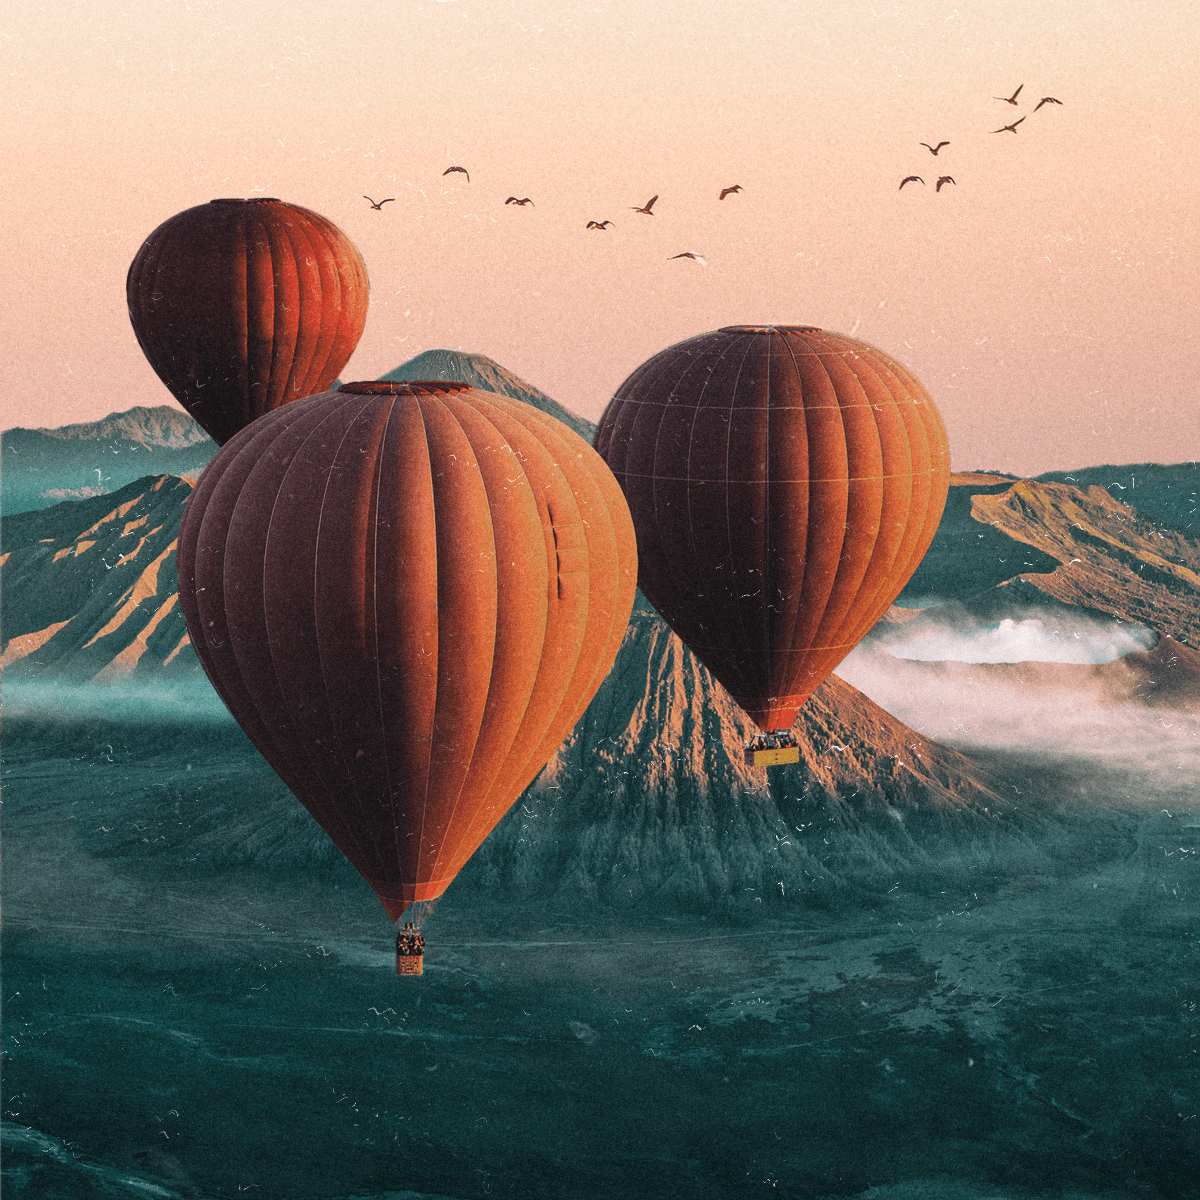 Image may contain: aircraft, balloon and transport